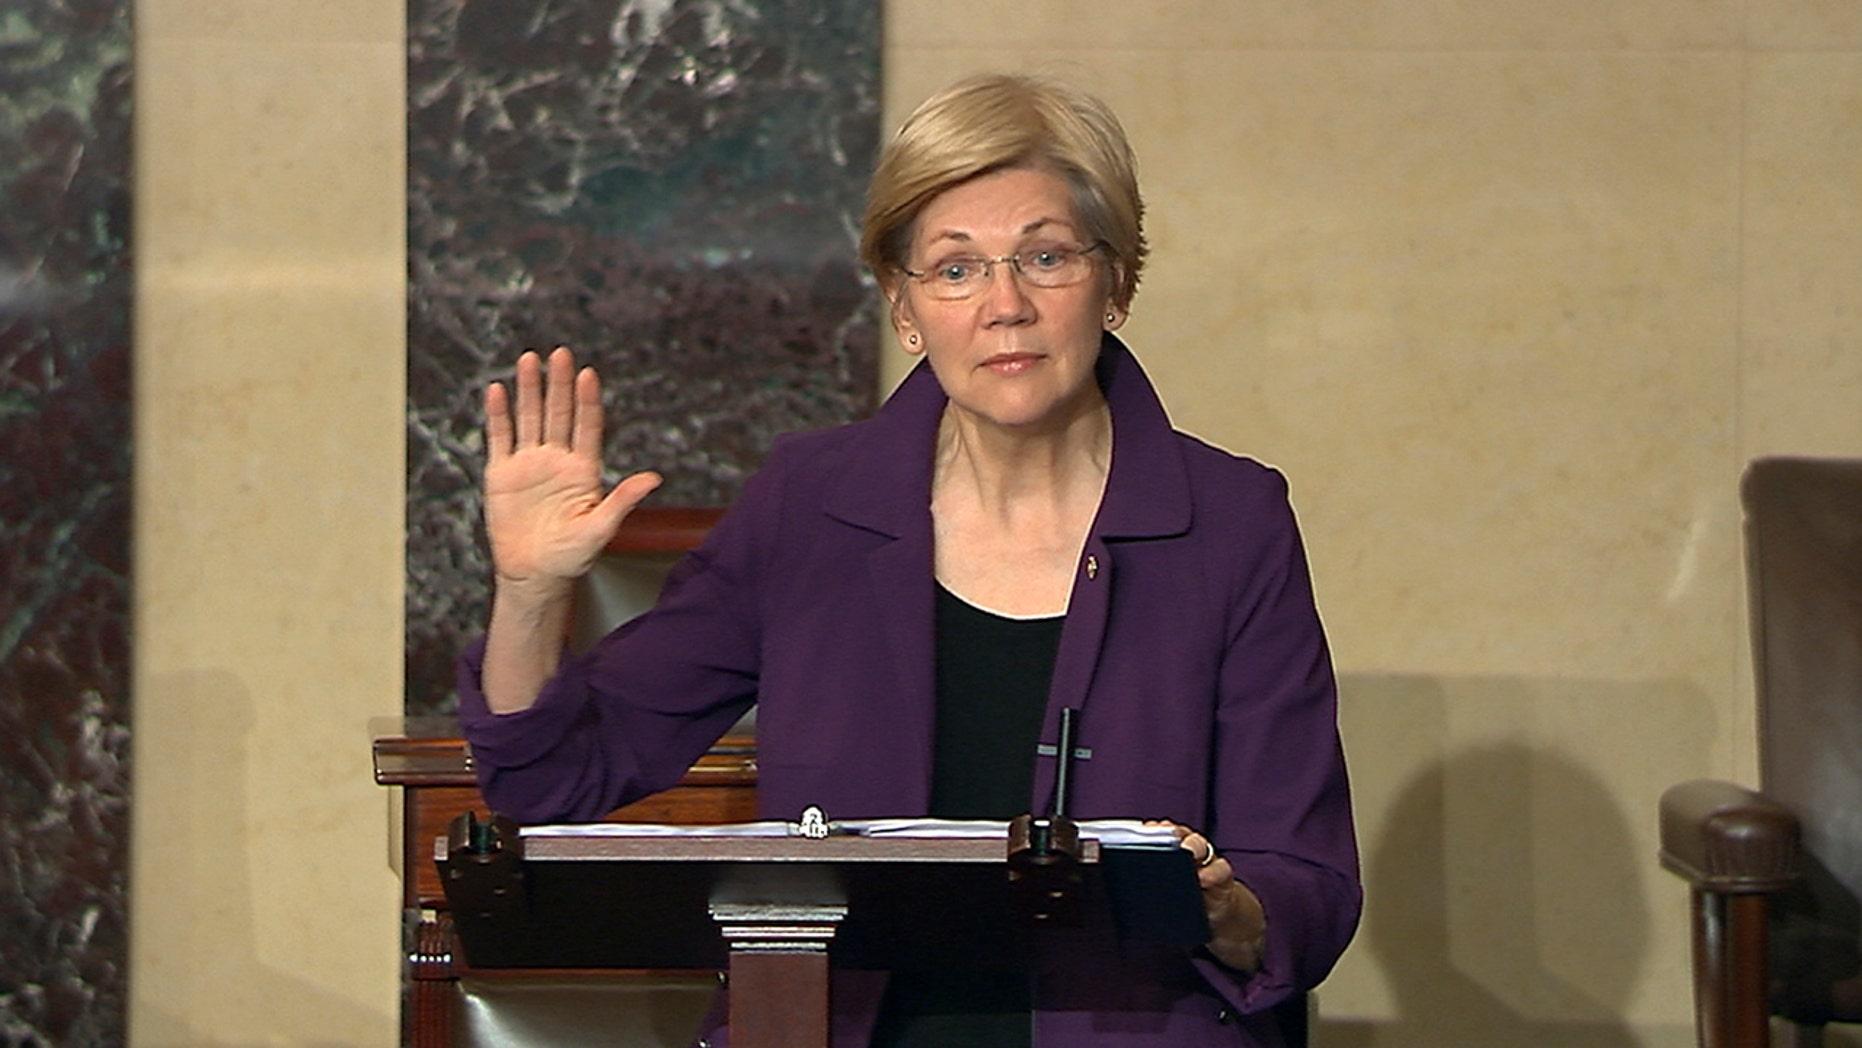 Feb. 6, 2017: Sen. Elizabeth Warren, D-Mass., speaks on the floor of the U.S. Senate in Washington about the nomination of Betsy DeVos to be Education Secretary.